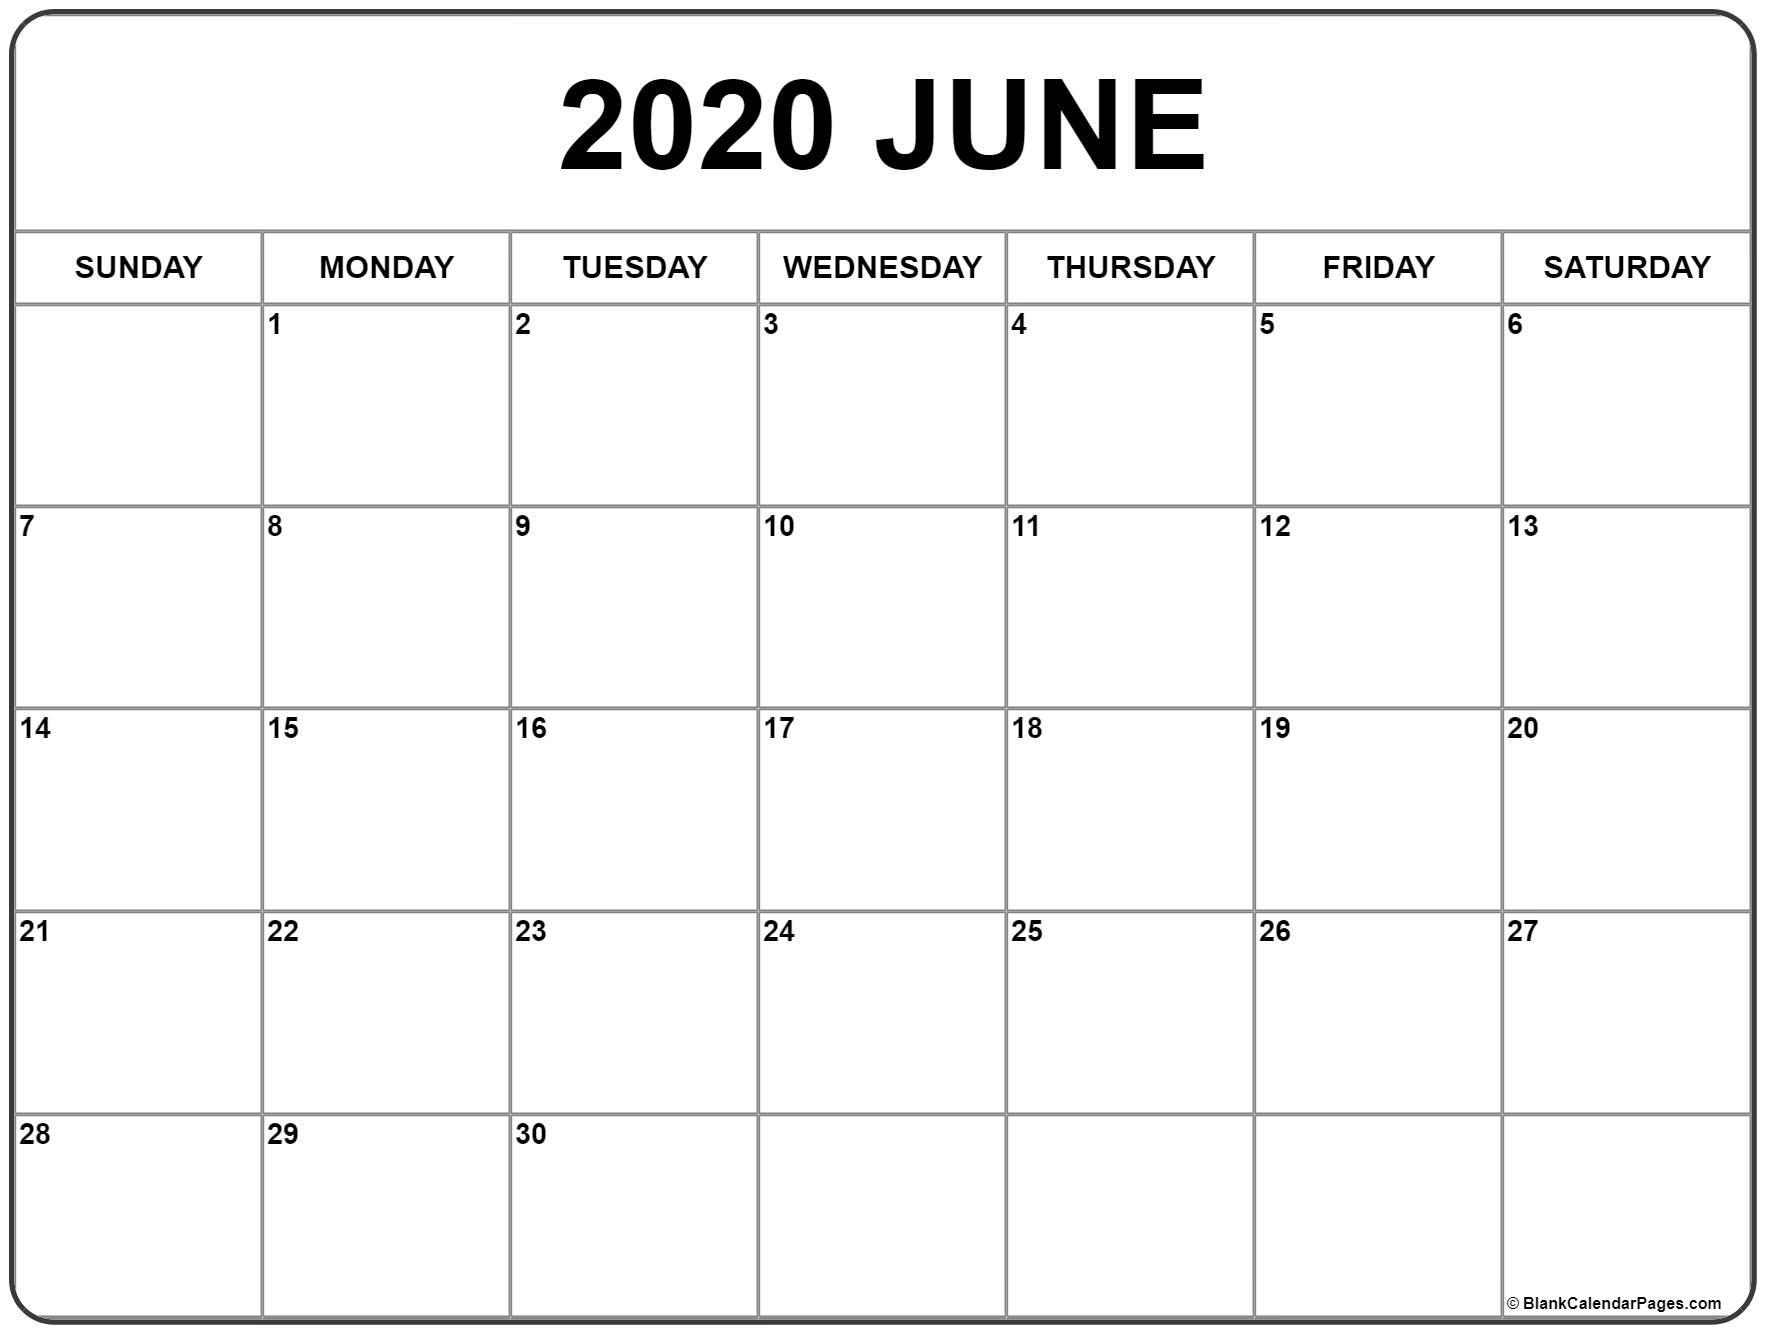 June 2020 Calendar | Free Printable Monthly Calendars intended for 2020 Printable Calendar - Sunday Thru Saturday